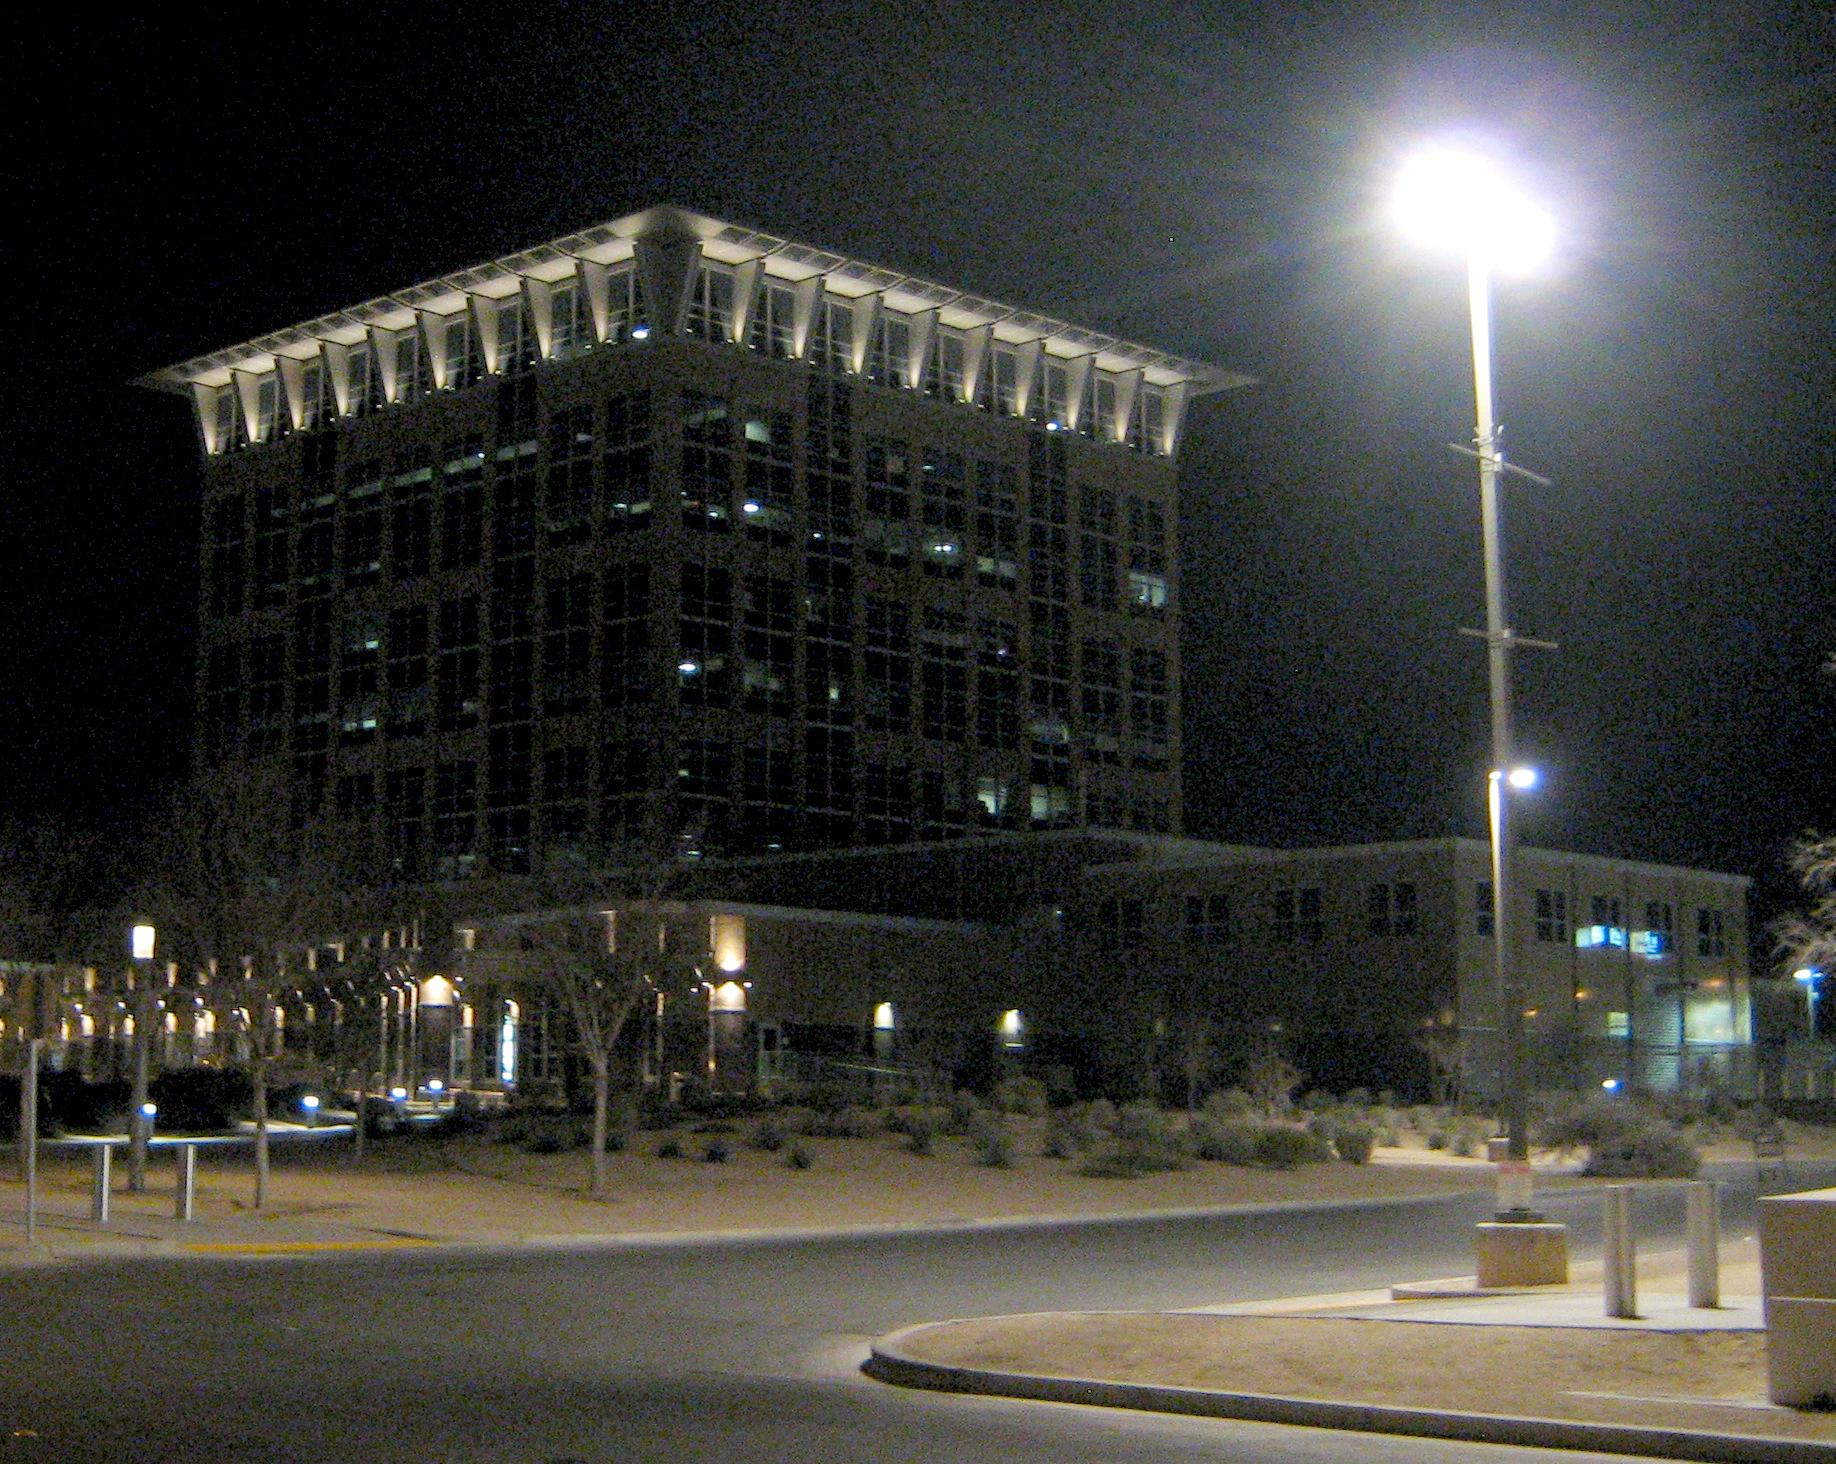 File:North Las Vegas City Hall At Night, February 2013.jpg